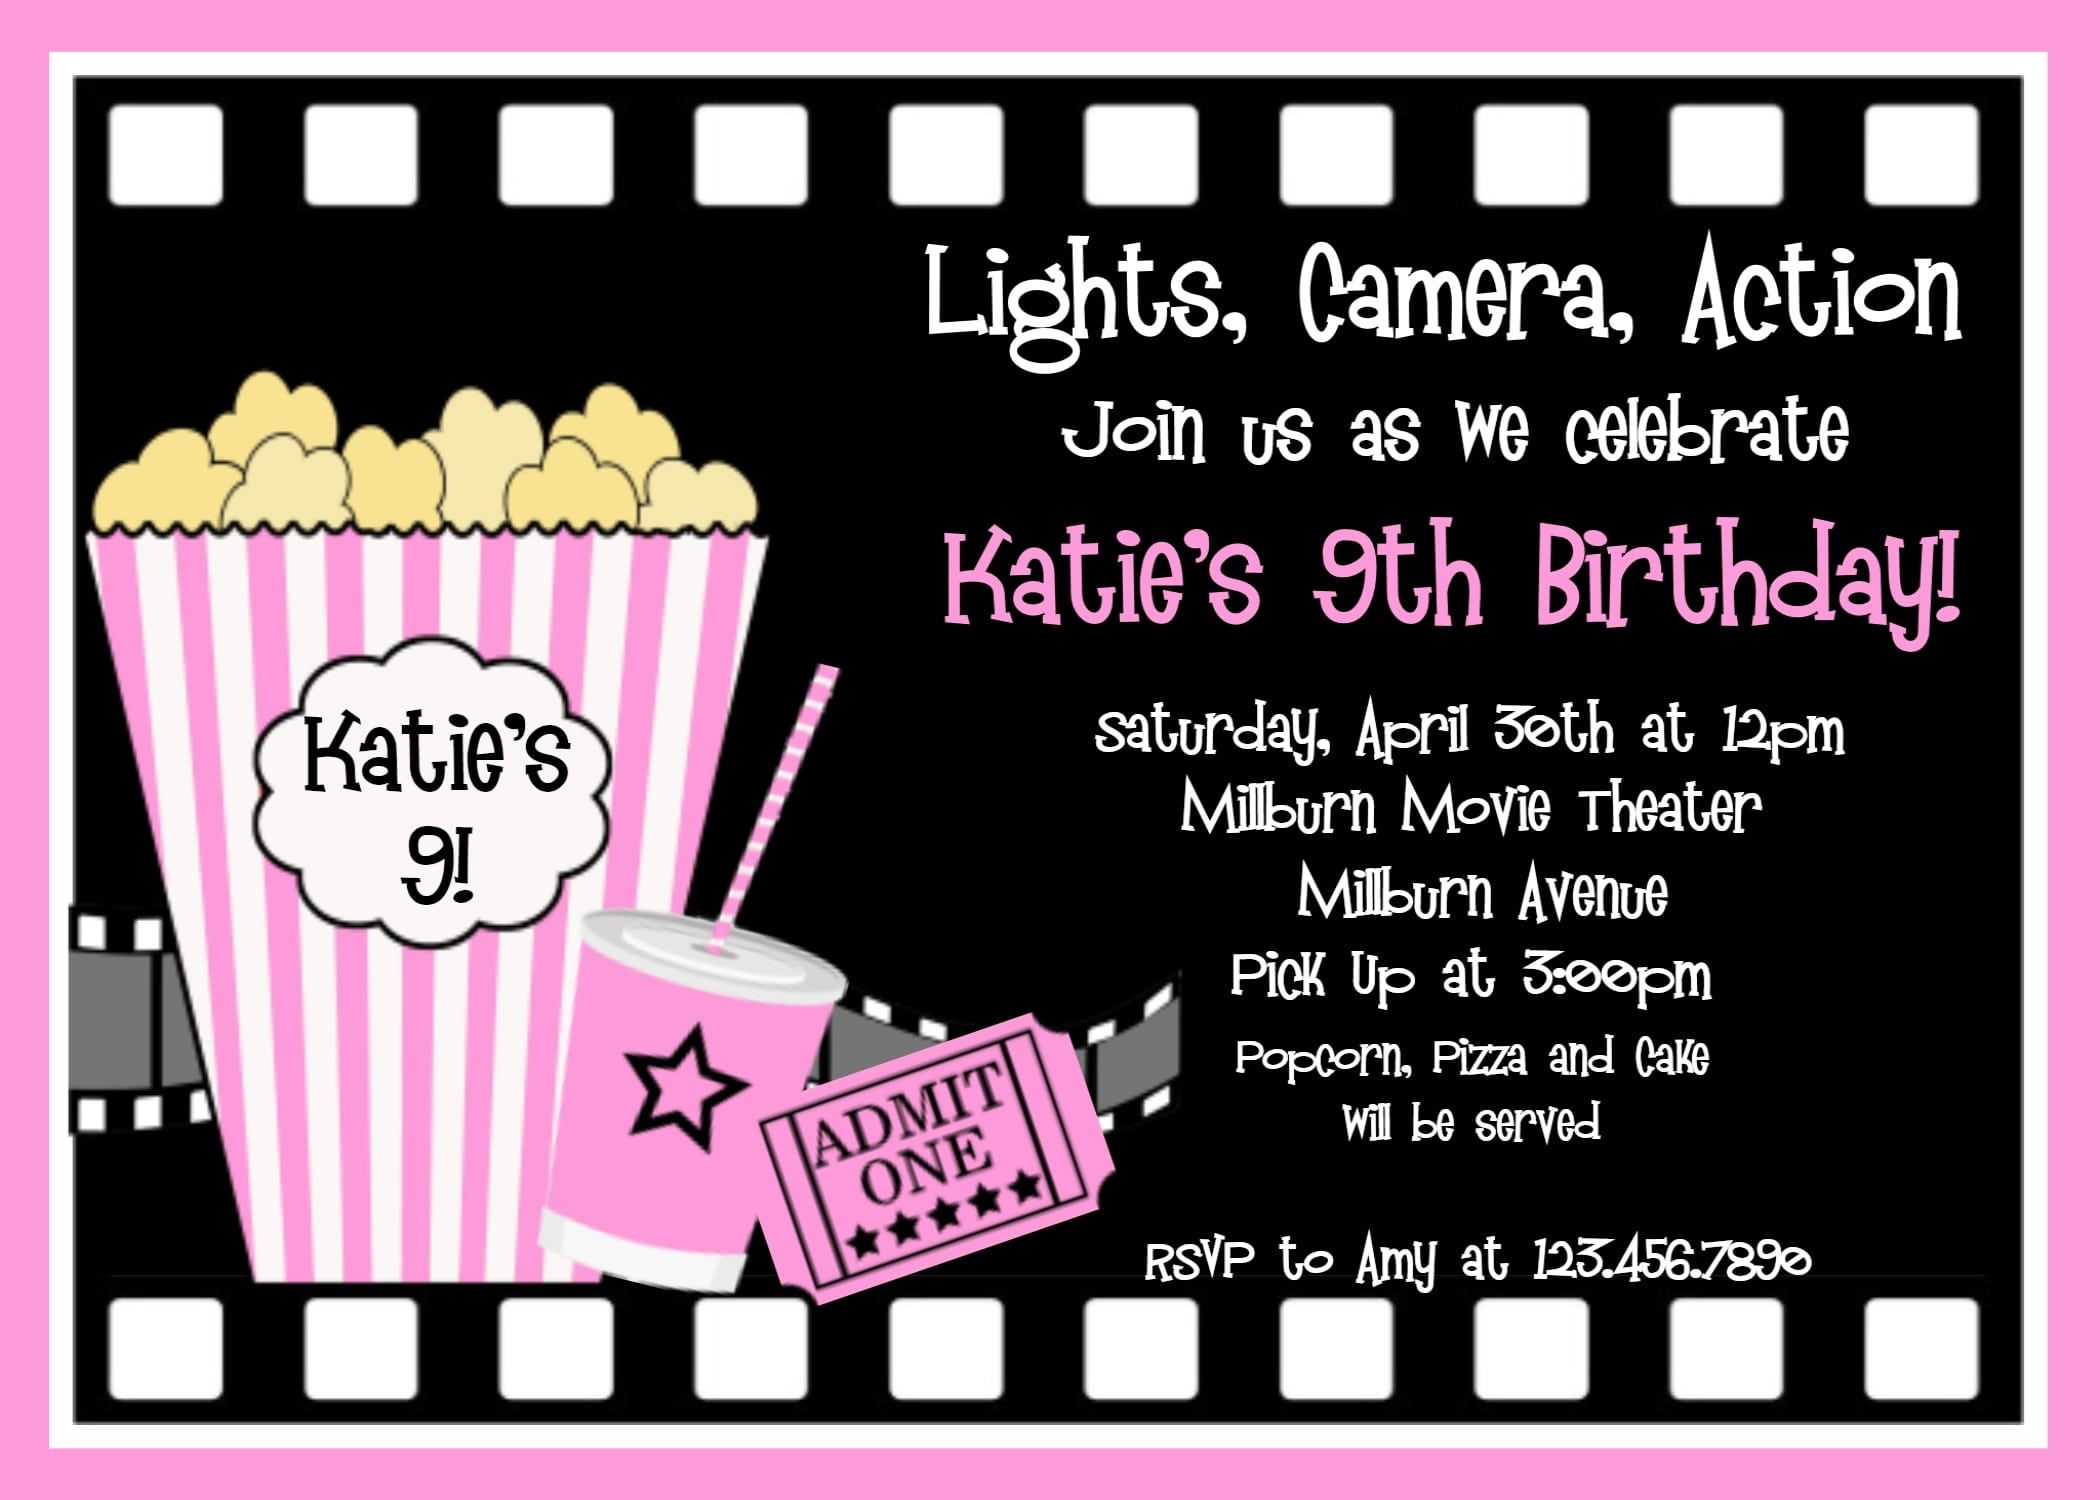 movie birthday party invitation template movie theme party movie party invitation template file kids movie party invitation